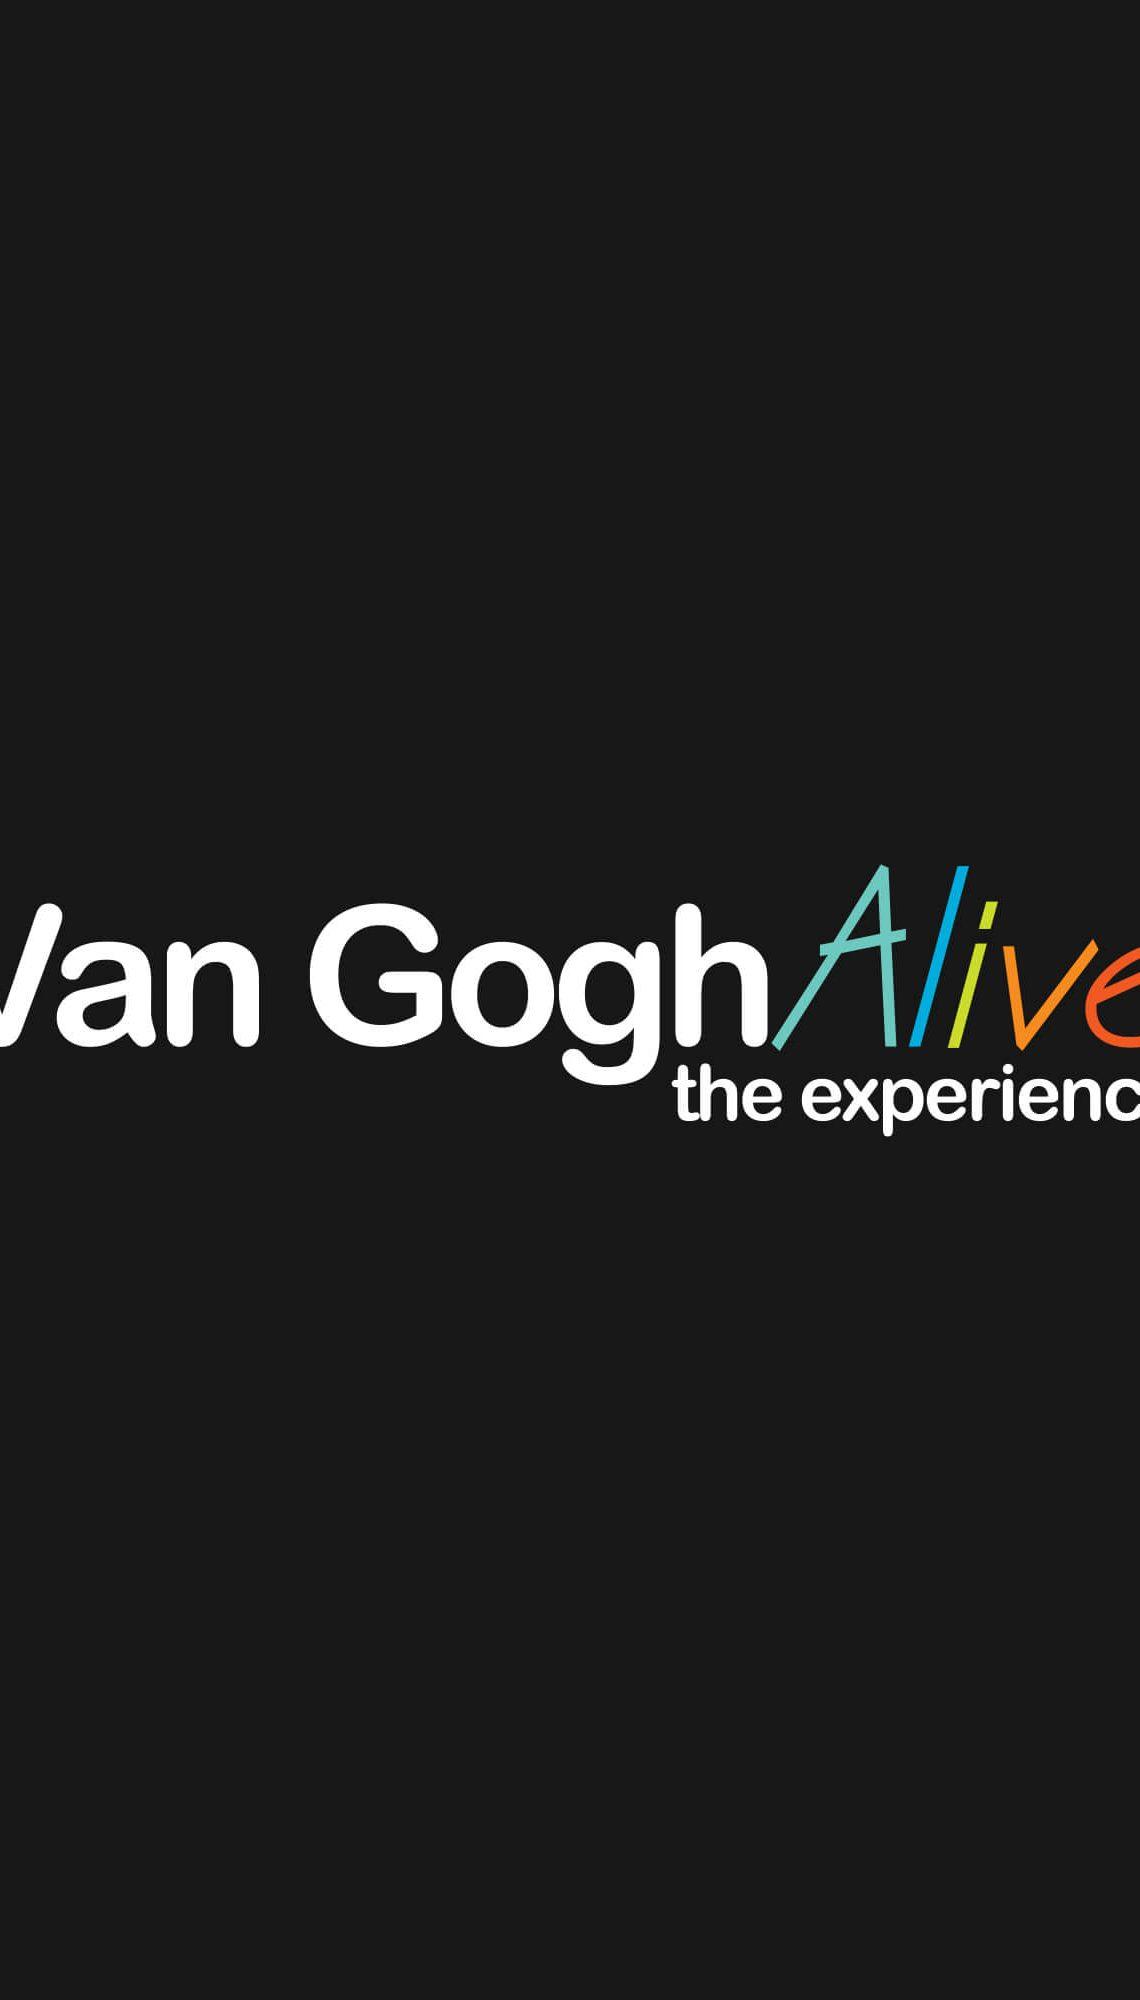 Van Gogh Alive Logo